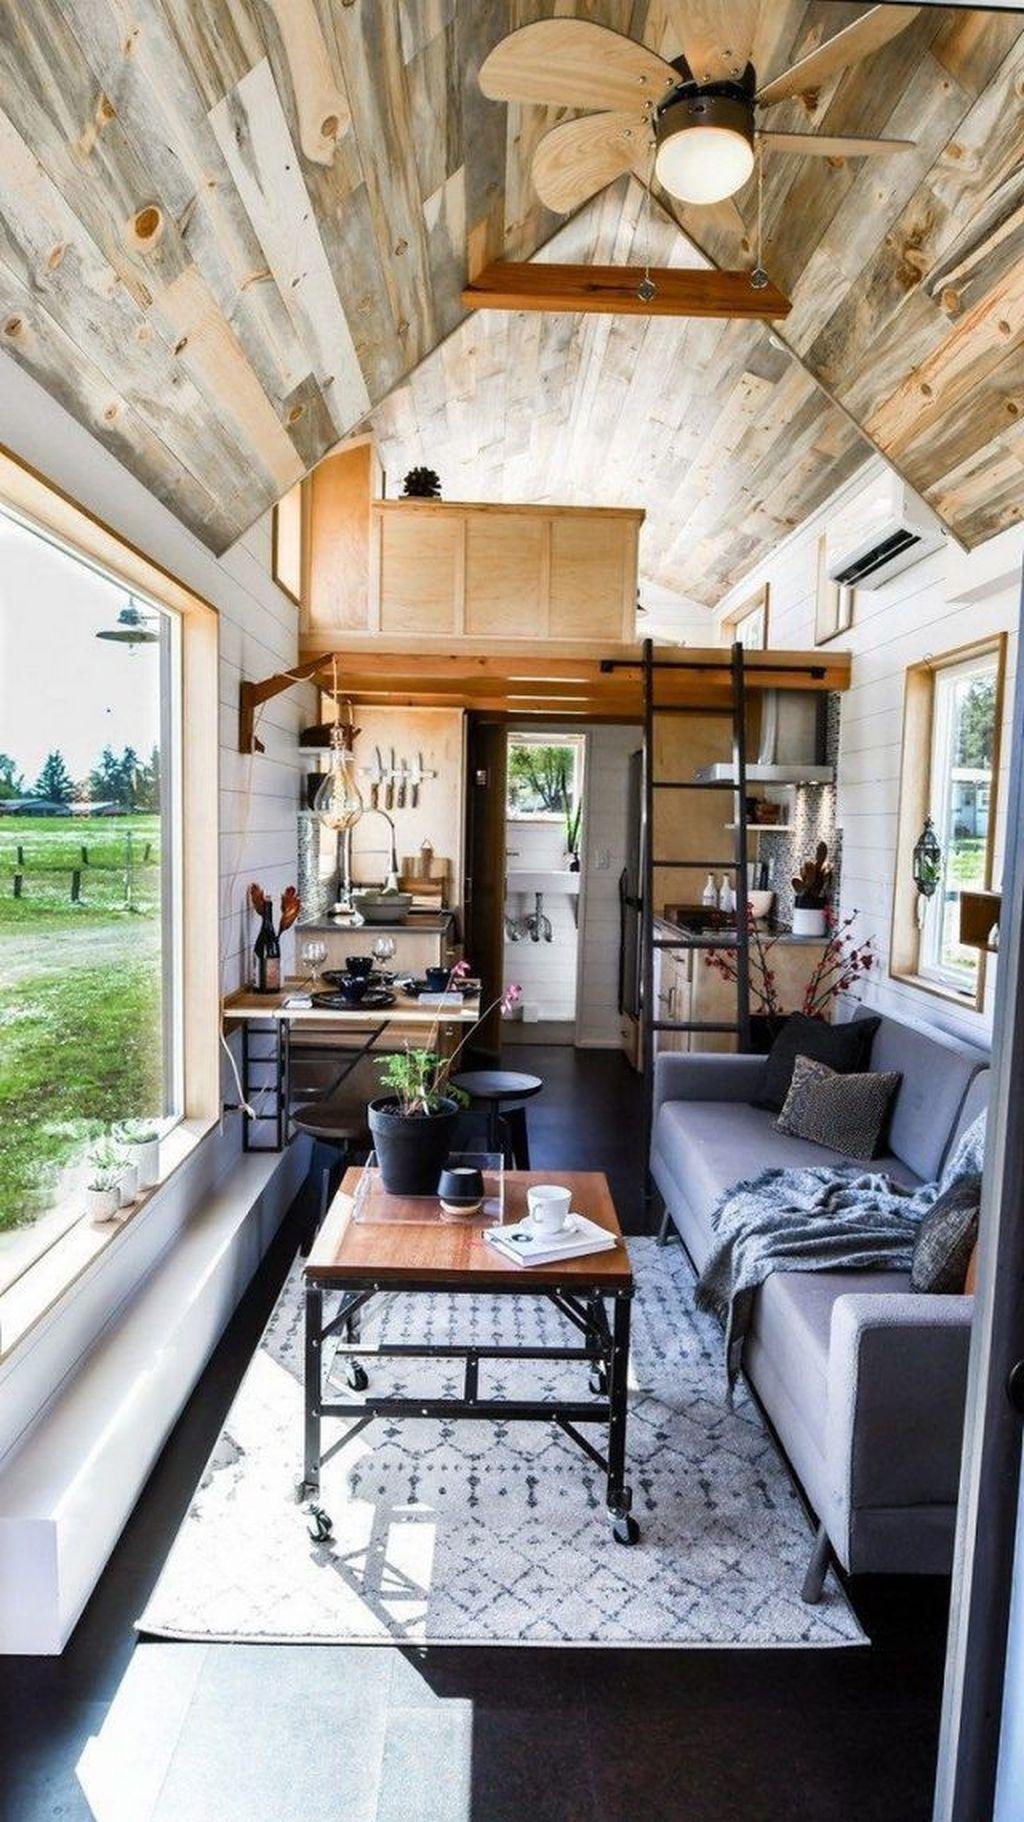 38 Comfy Tiny Houses Living Room Design Ideen Fur Die Beste Wahl